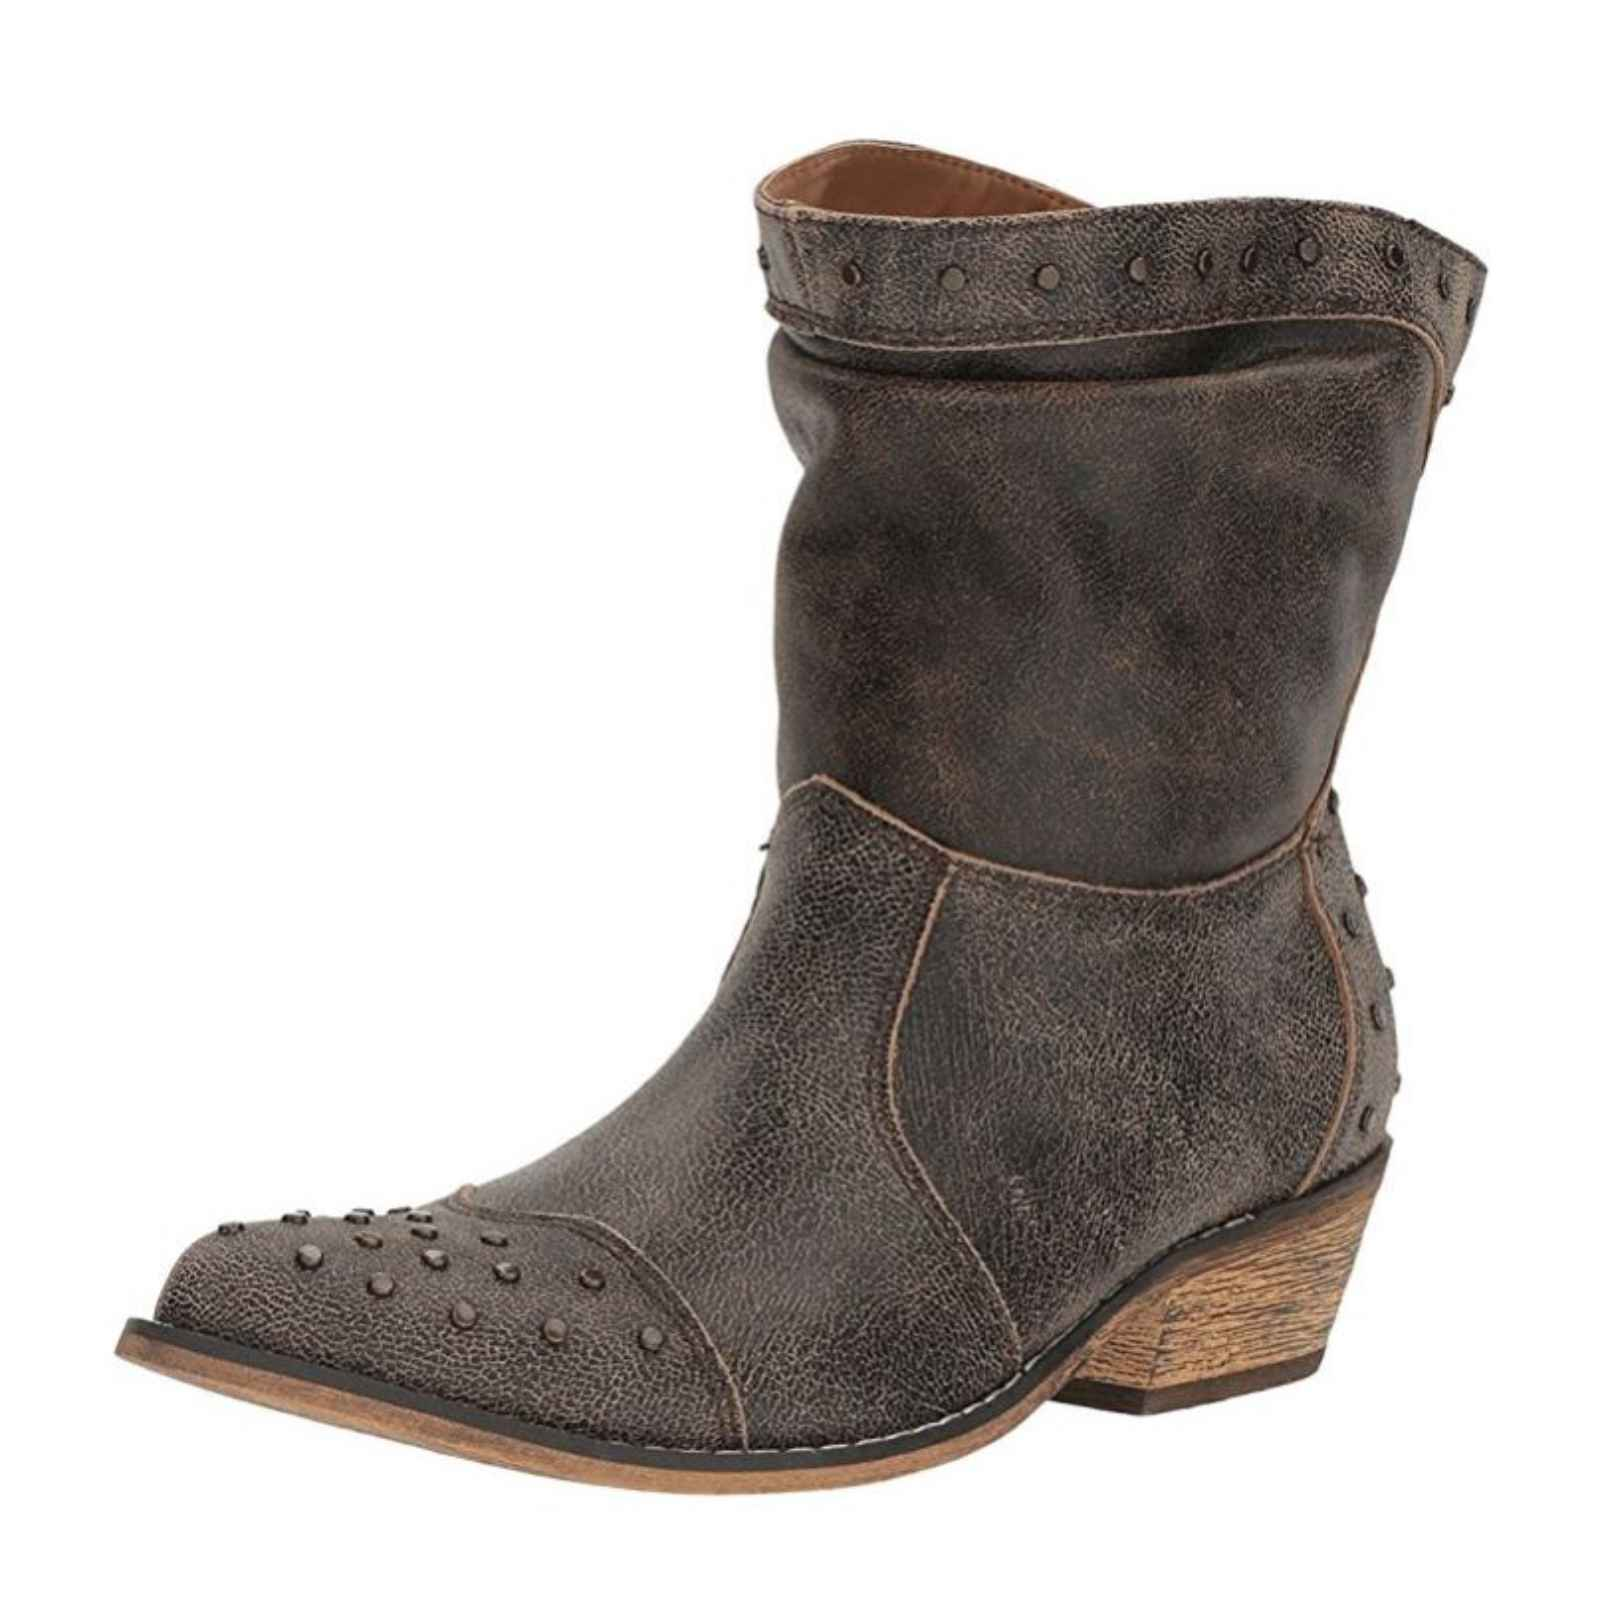 "Dingo Ladies 7"" Western Slouch Boots Black Tan, DI 744 by Dingo"